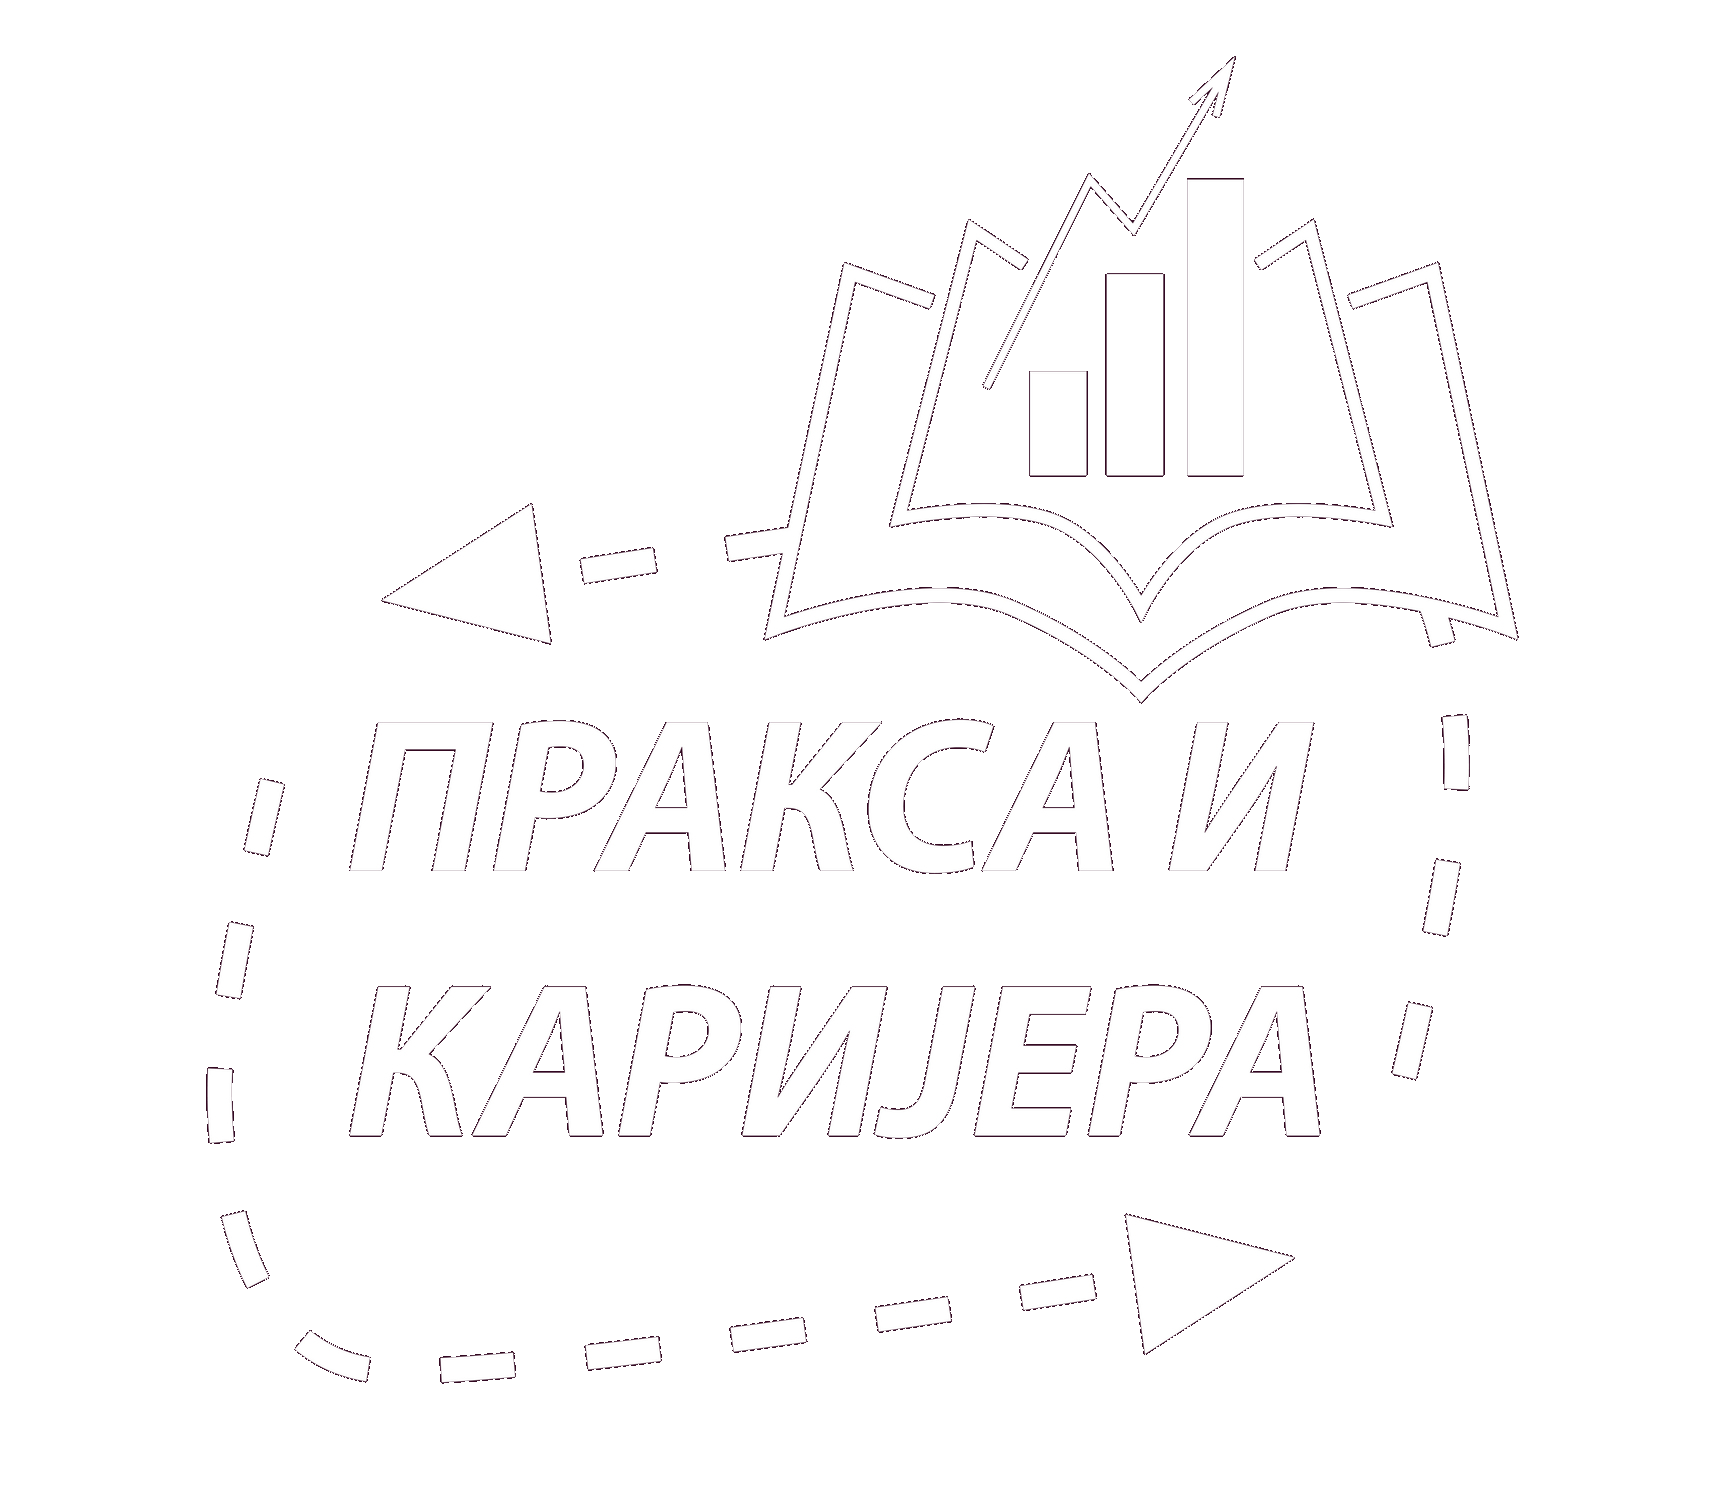 oie_transparent